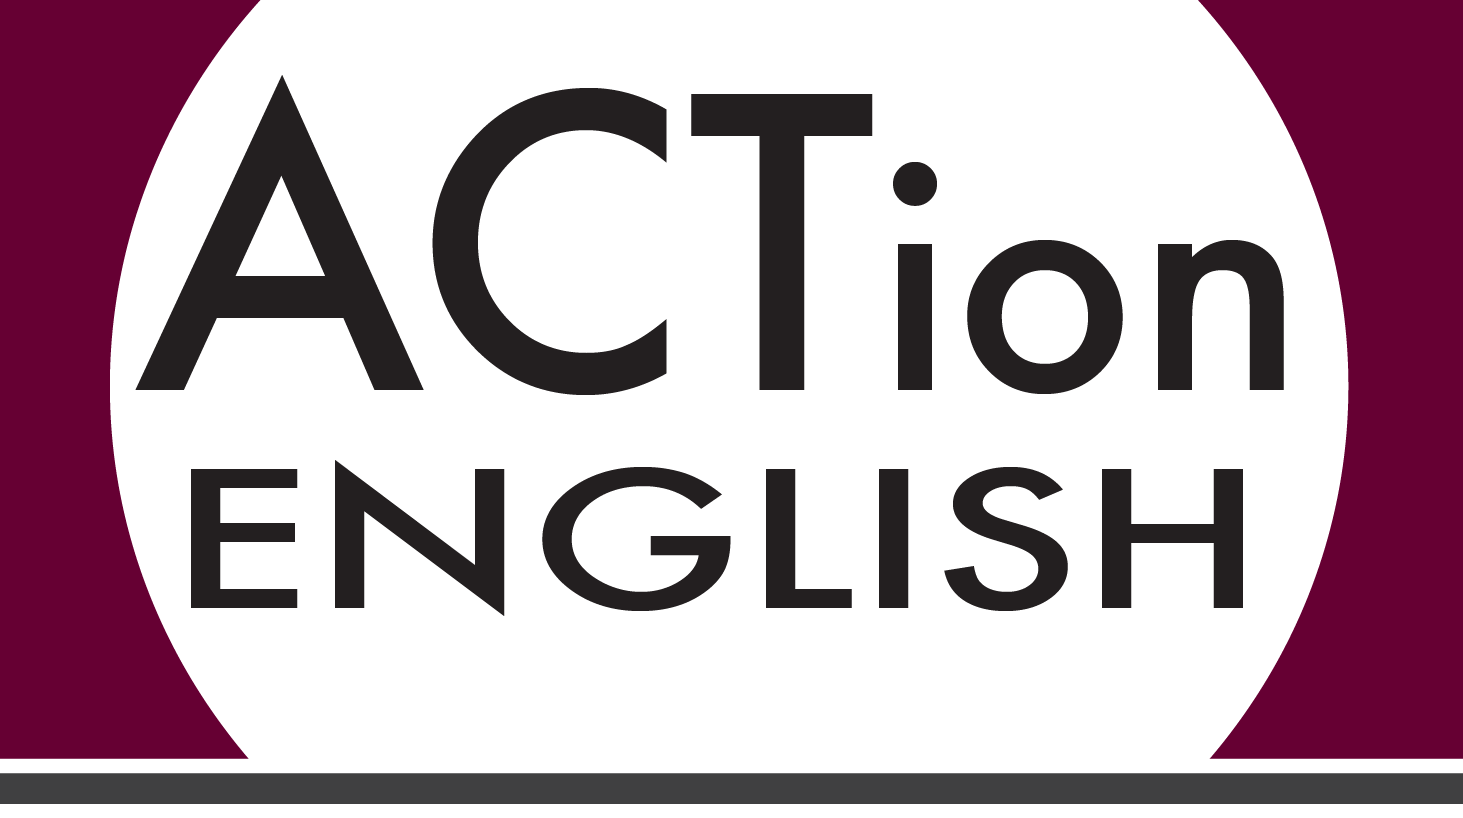 Clases de teatro en inglés